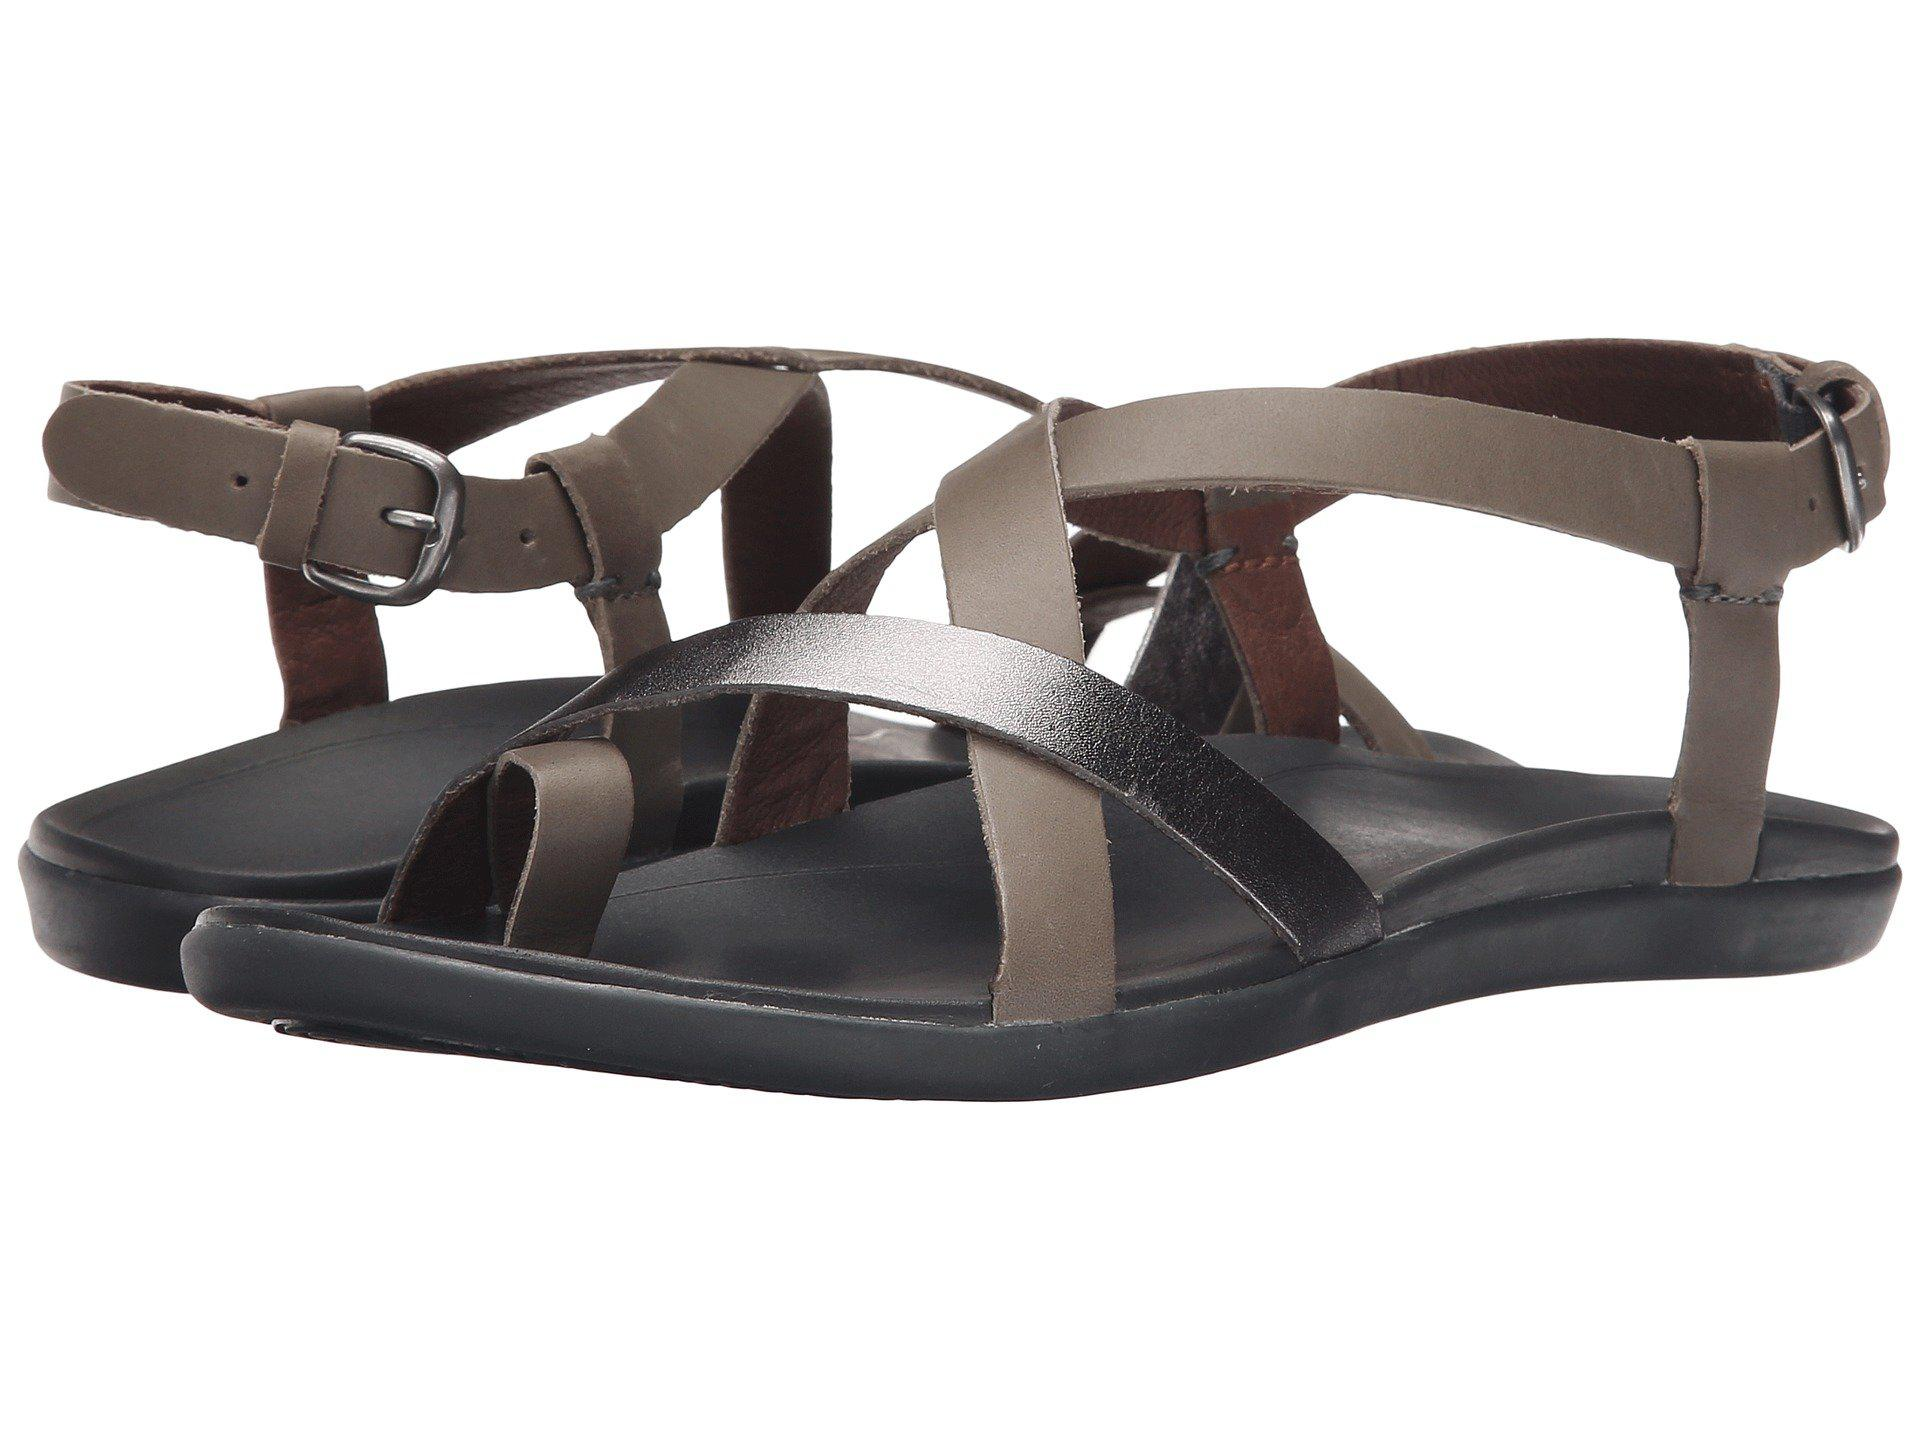 2de9fbd81e5 Lyst - Olukai Upena (mustard bubbly) Women s Sandals